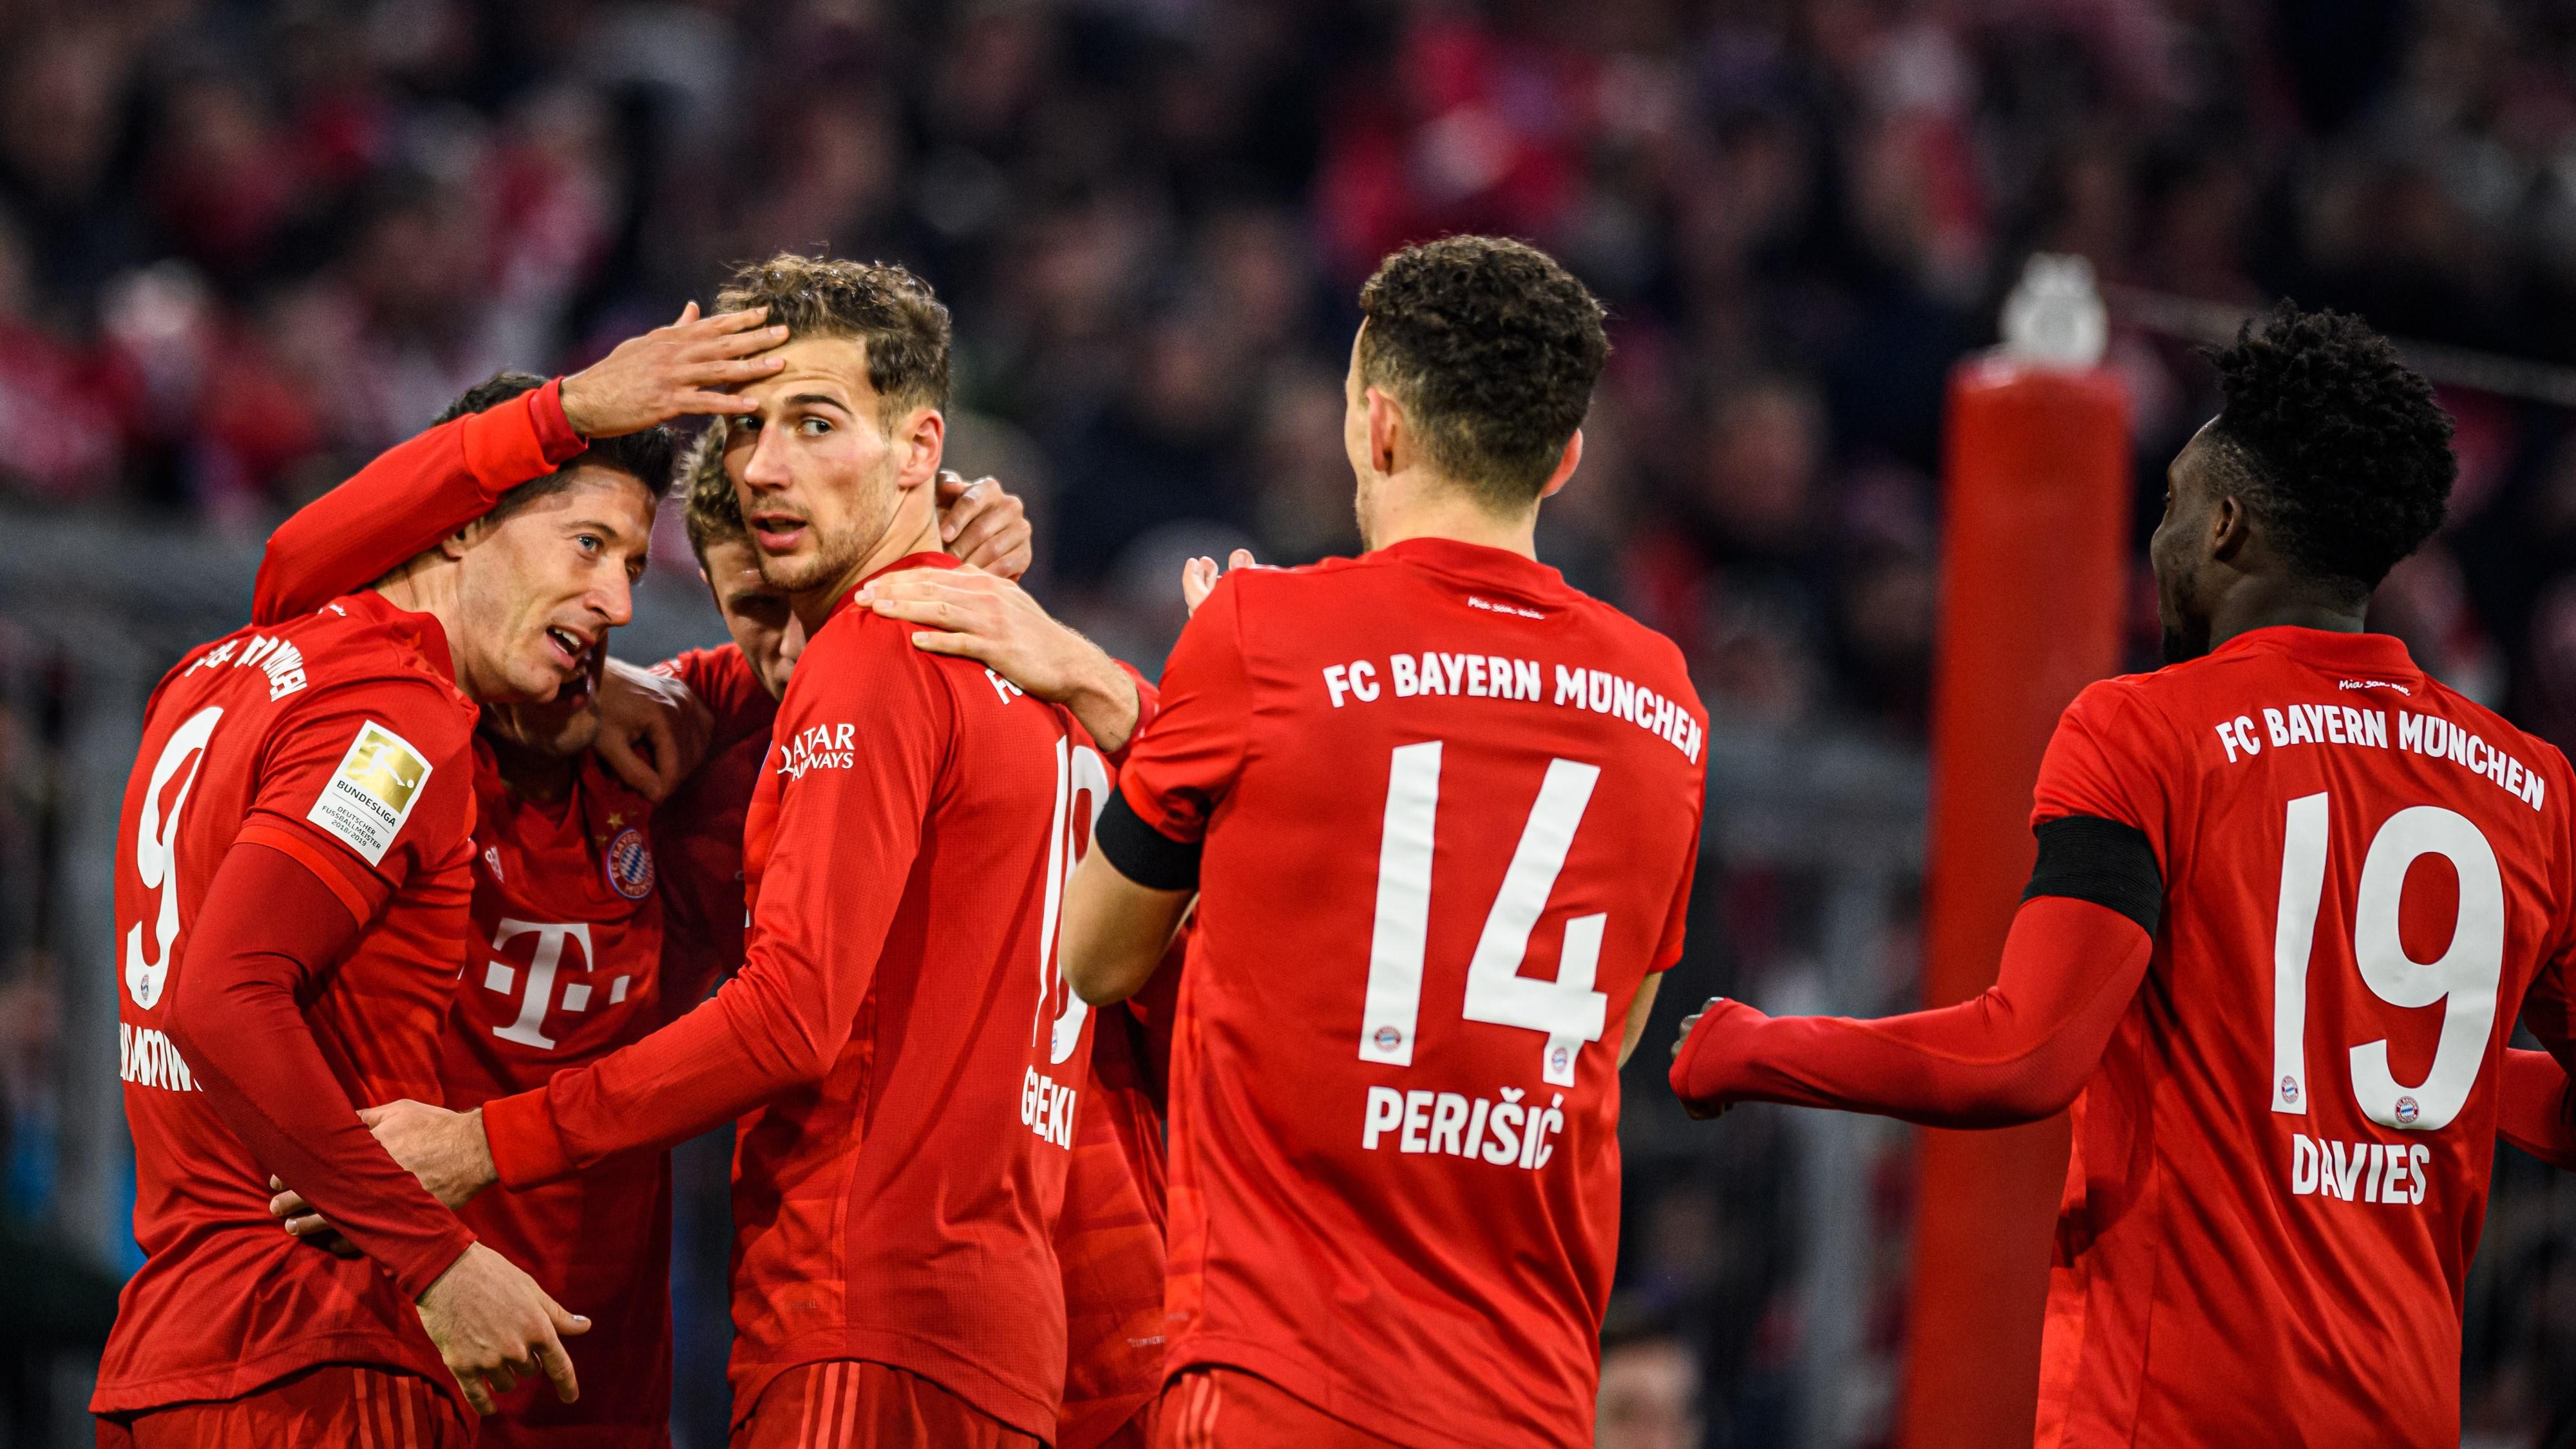 Union Berlin vs Bayern Munich live stream: how to watch Bundesliga online from anywhere